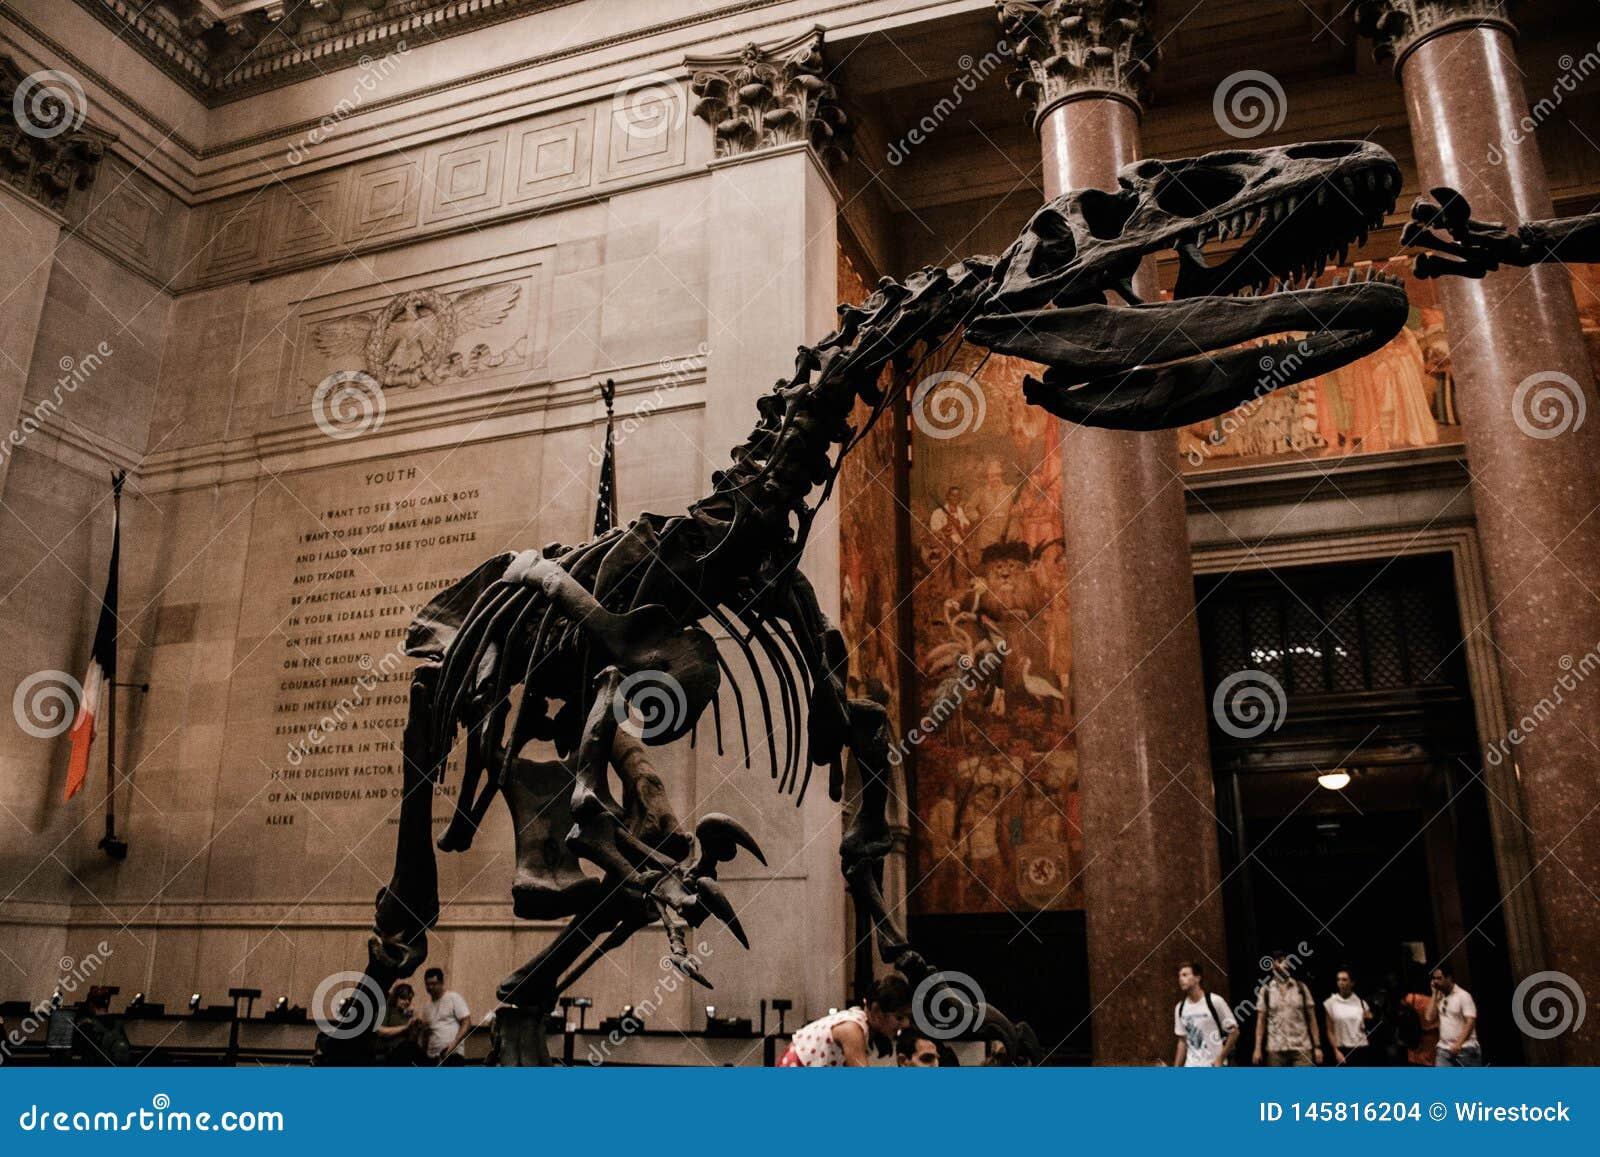 A decorative skeleton of a dinosaur